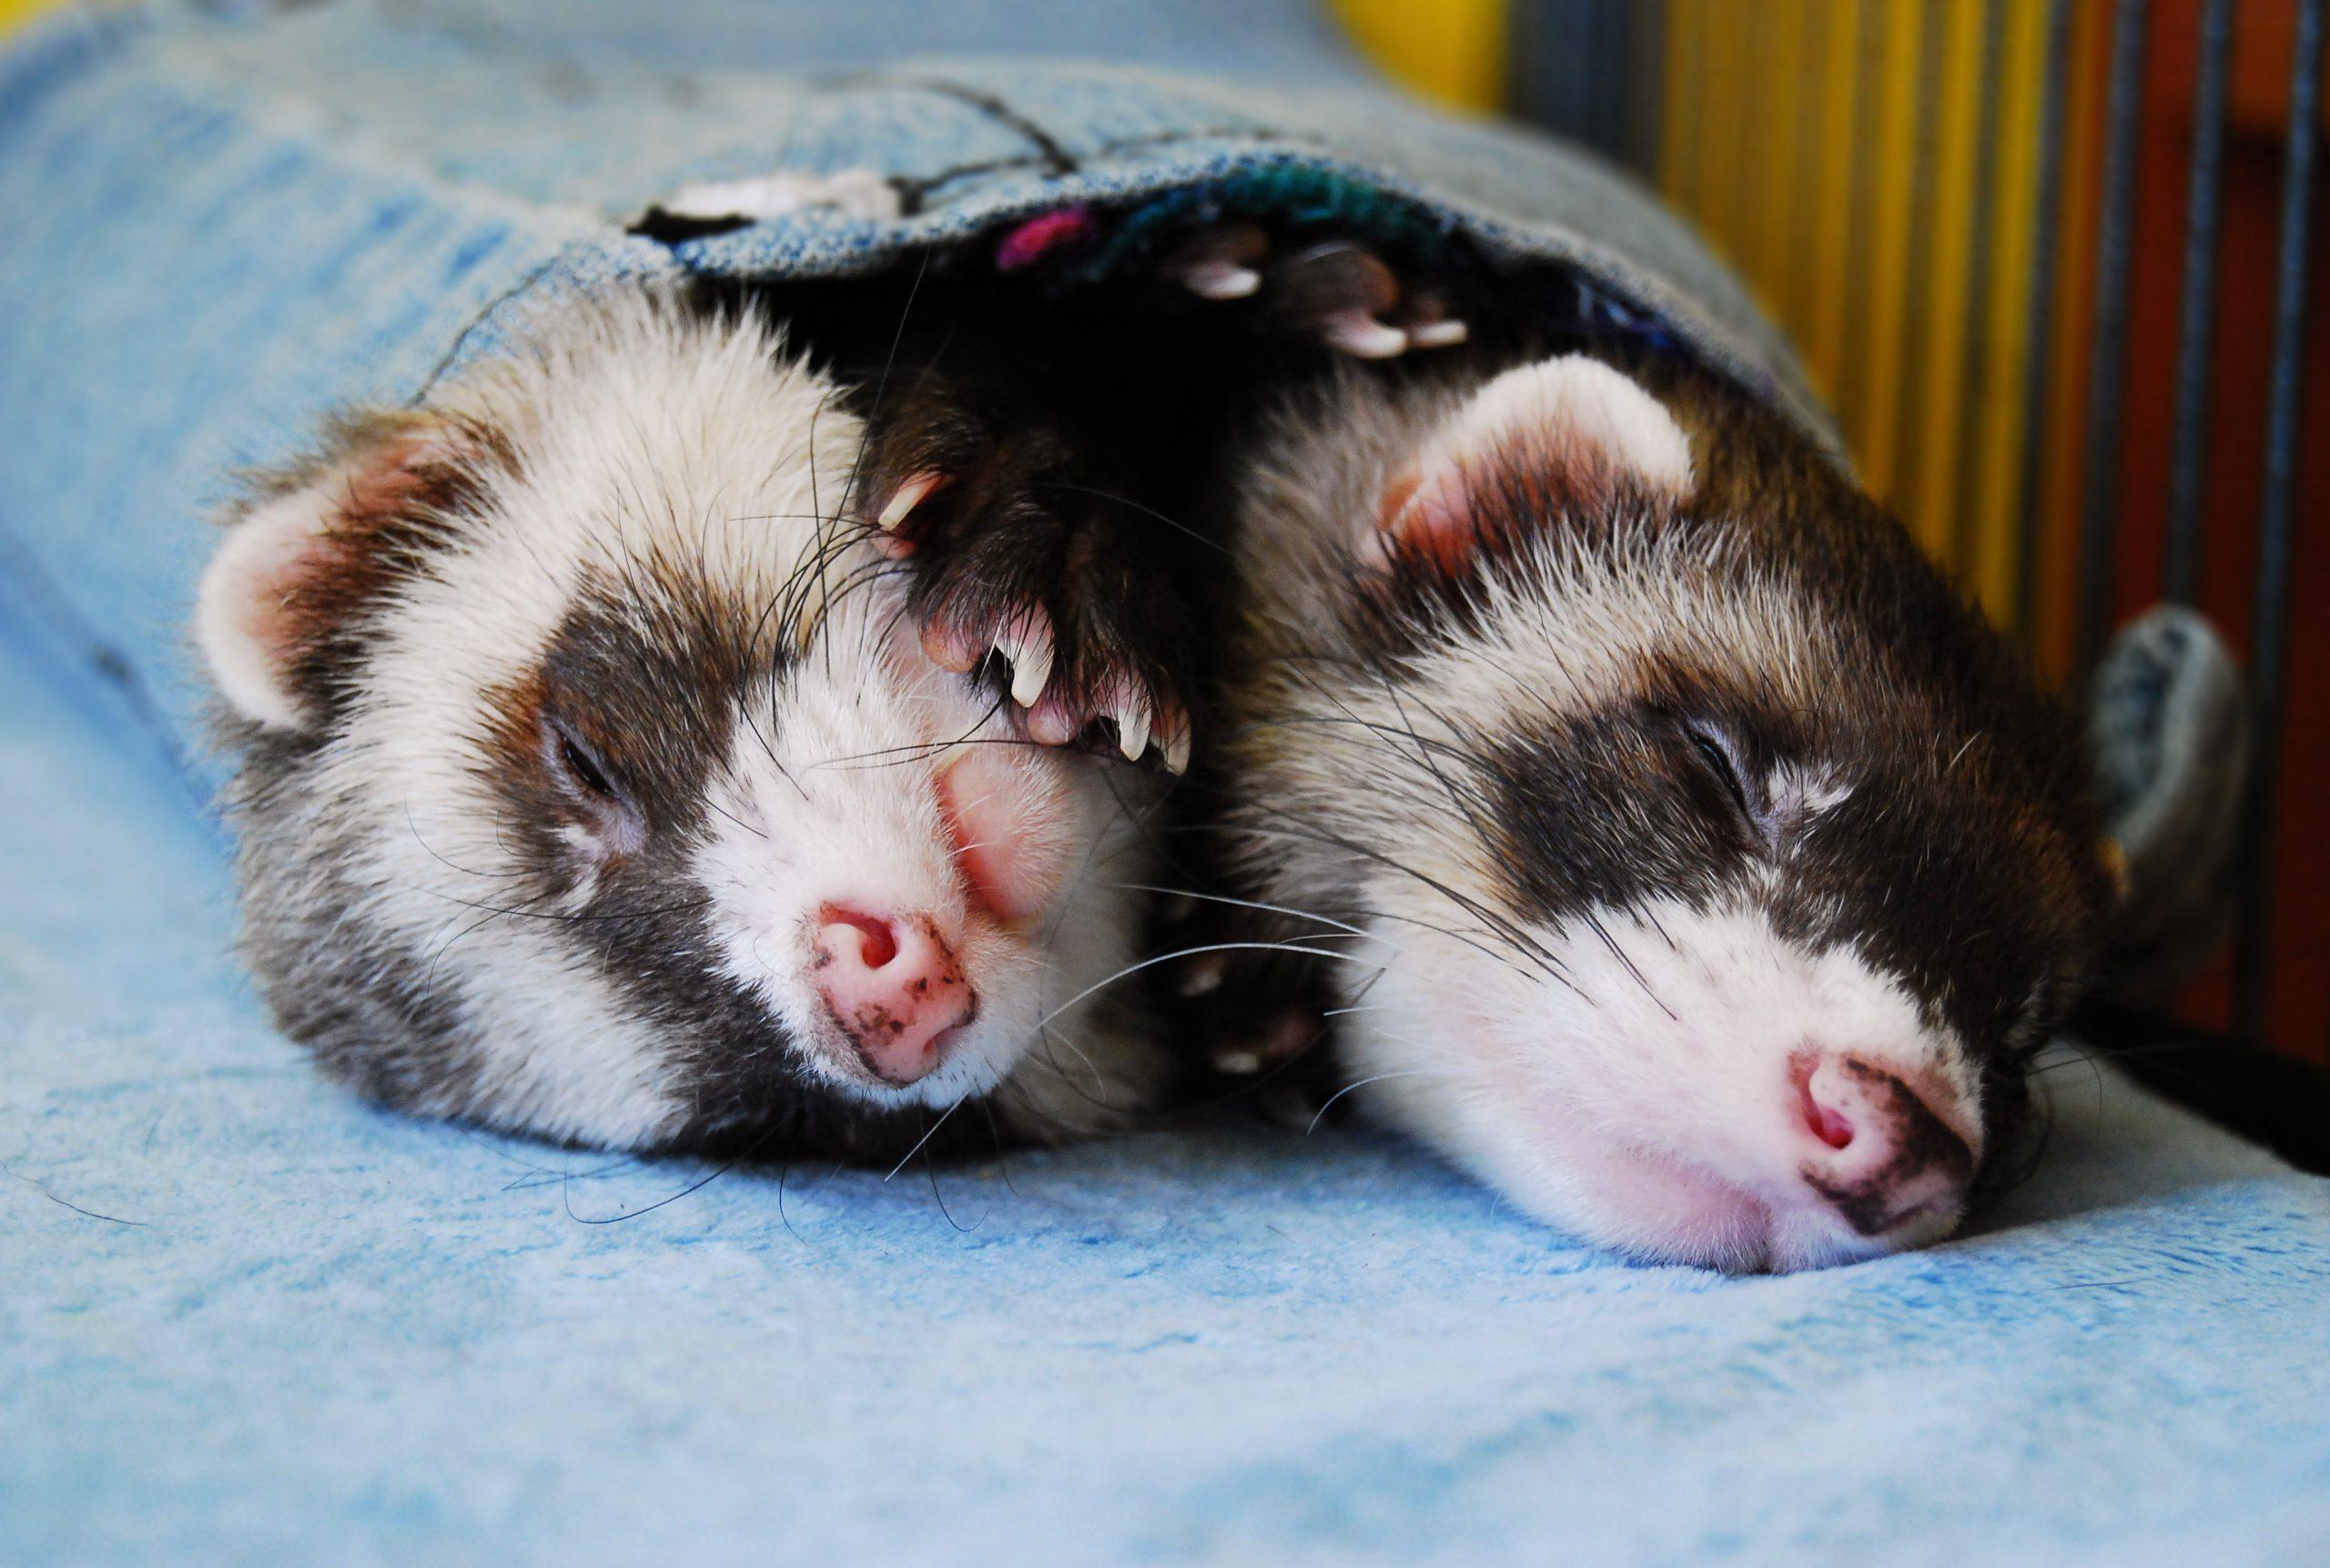 Two sable ferrets sleeping